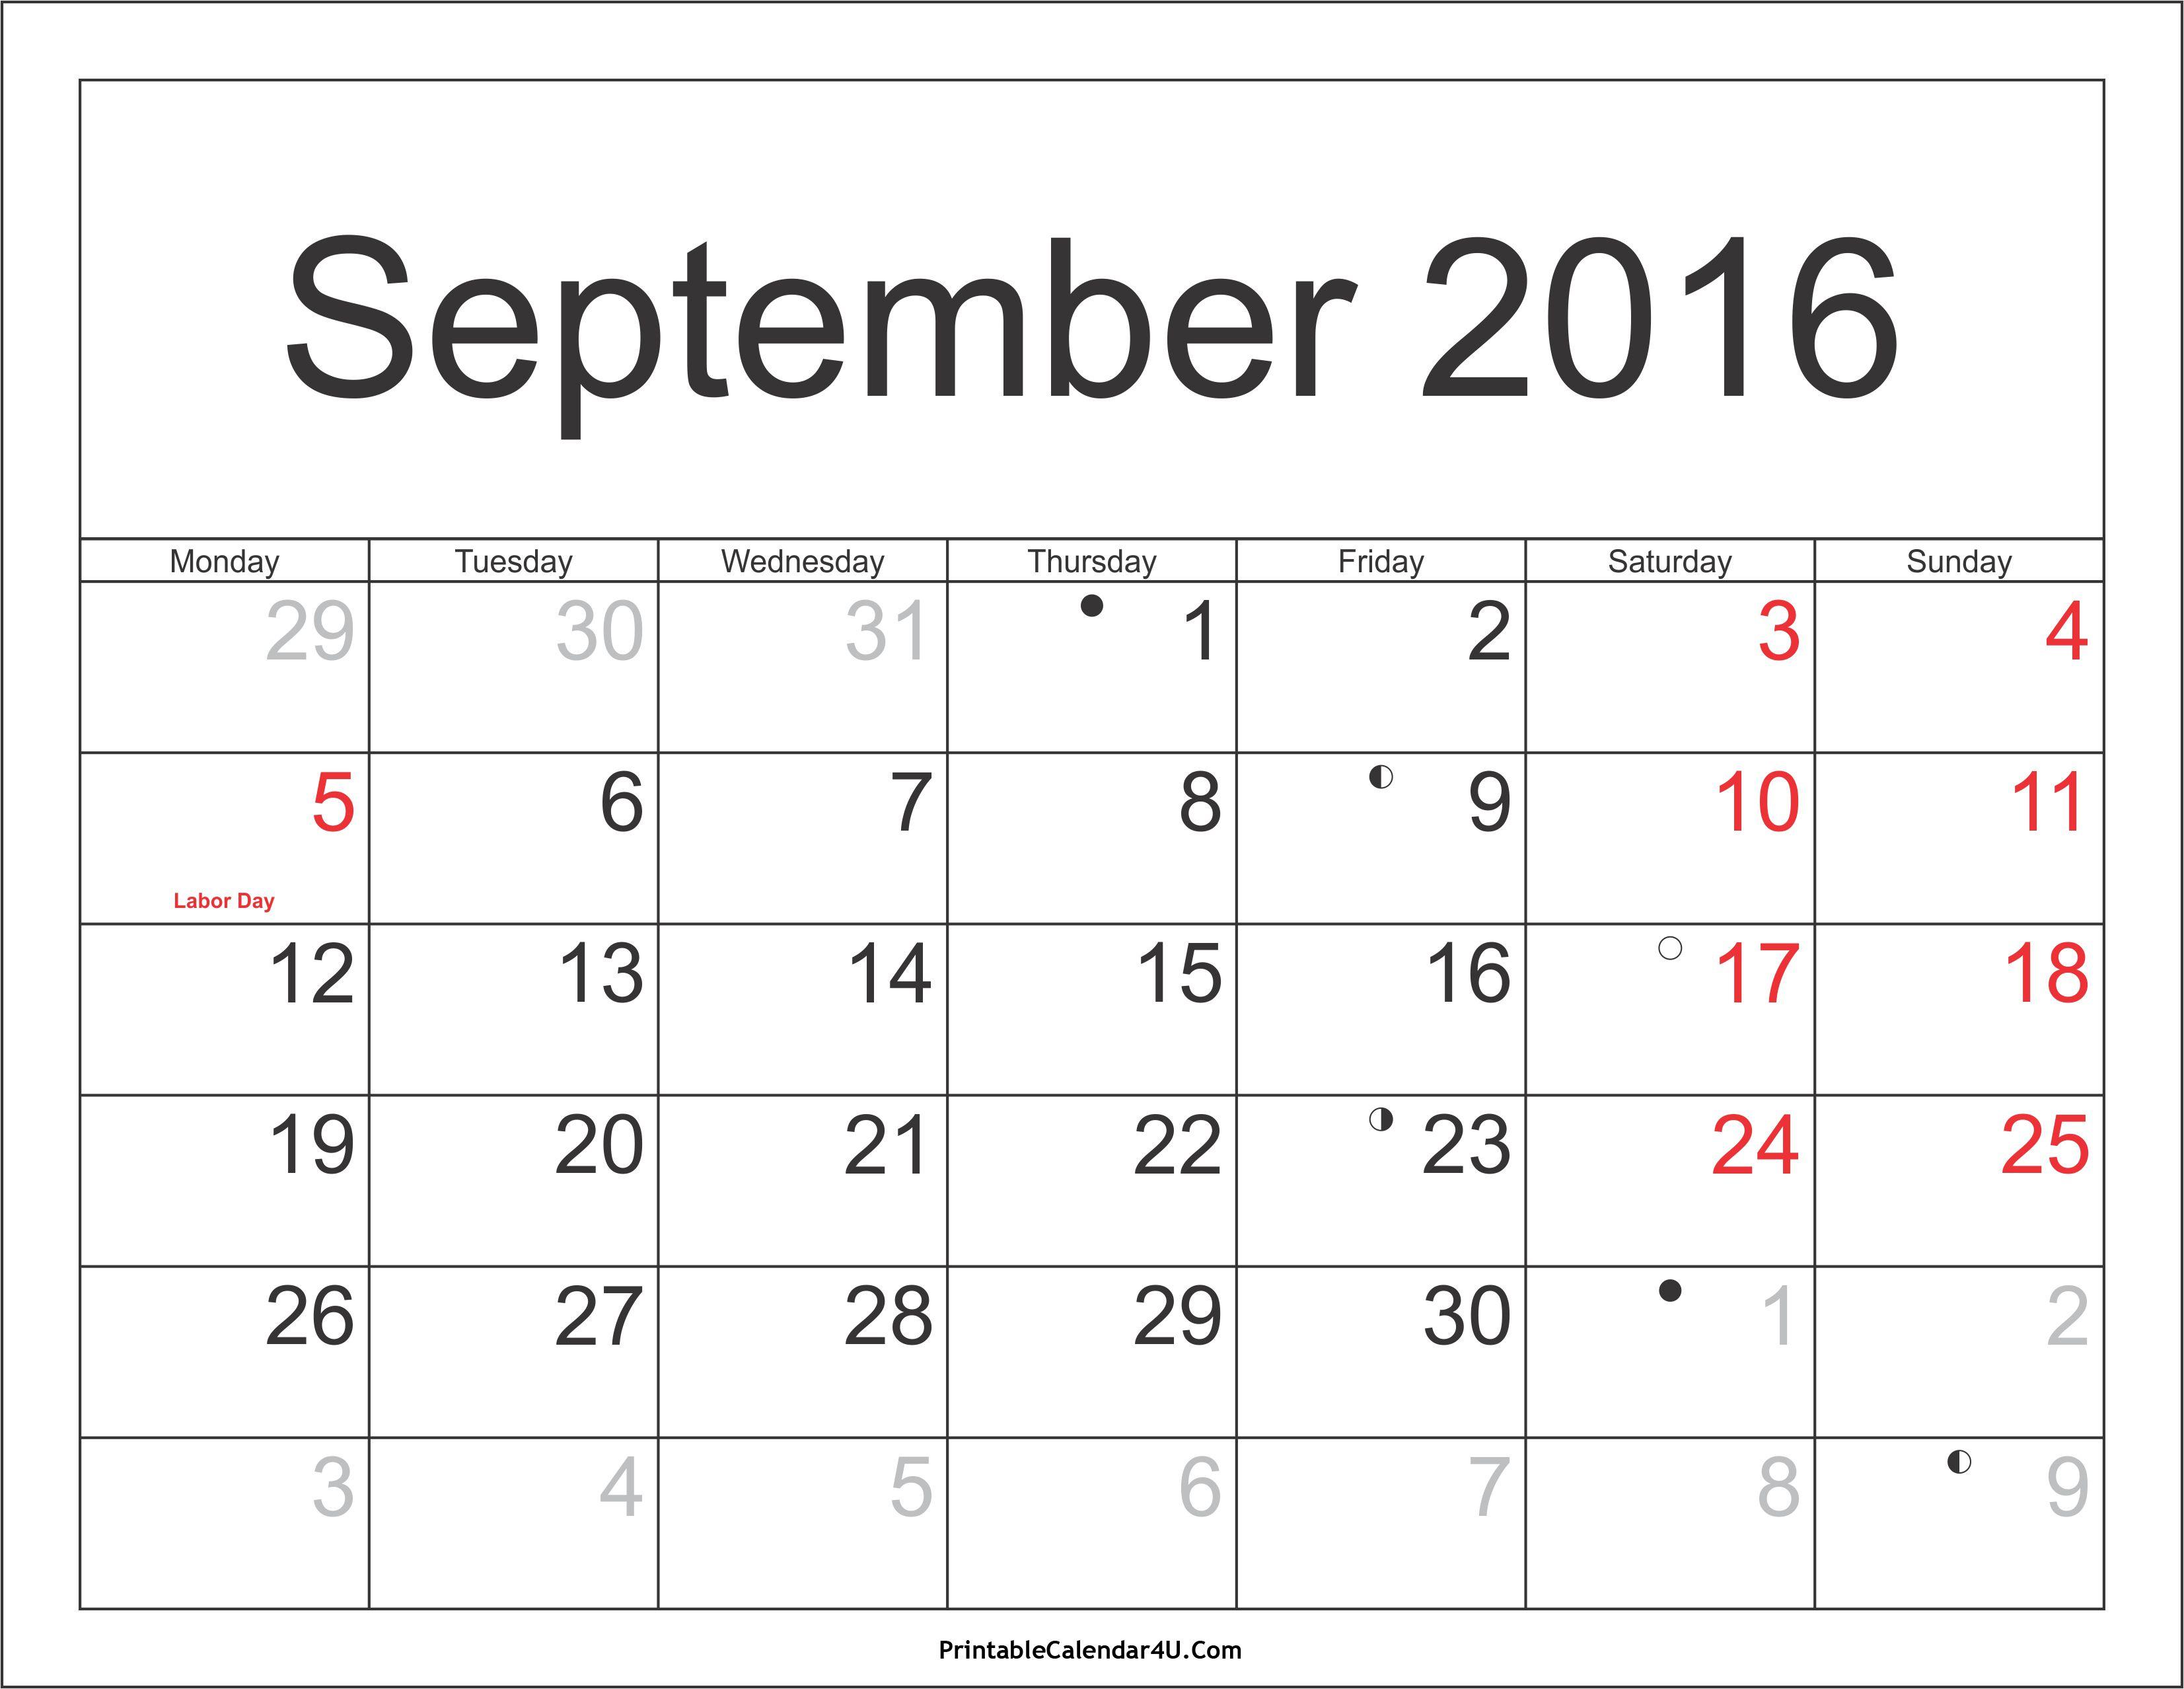 September 2016 Calendar Print With Images November Calendar